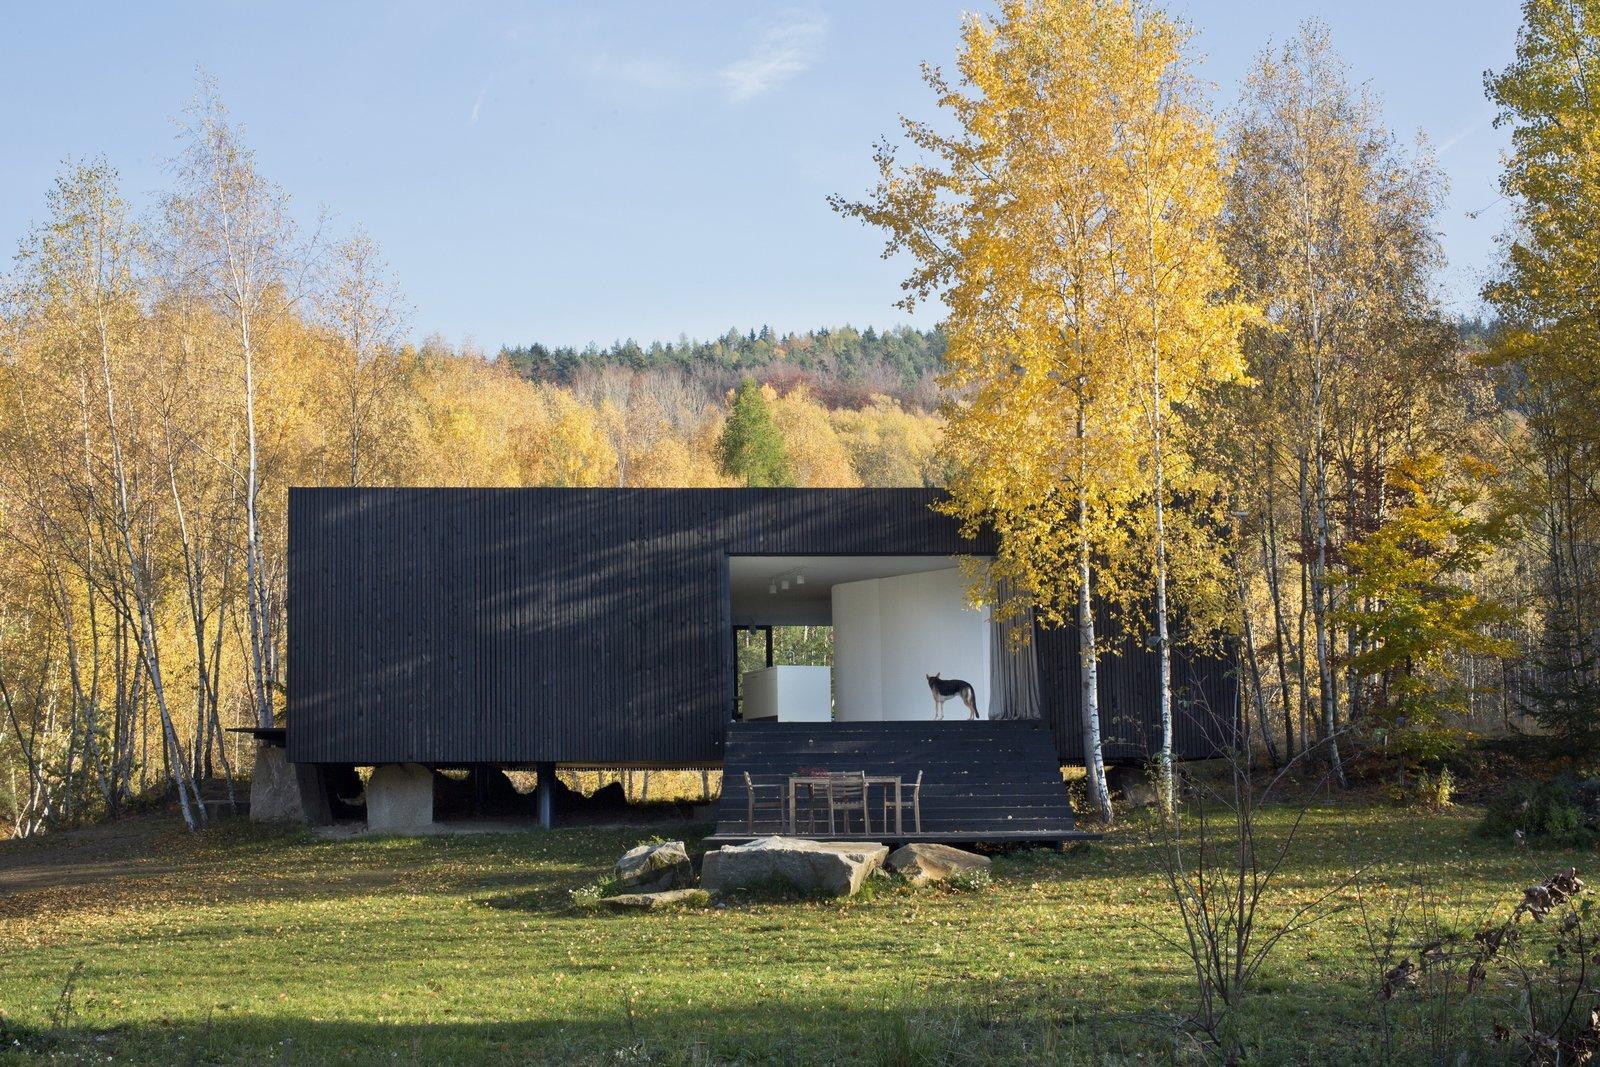 Tagged: Outdoor, Back Yard, Trees, and Grass.  Family House Prototype by Matej Šišolák